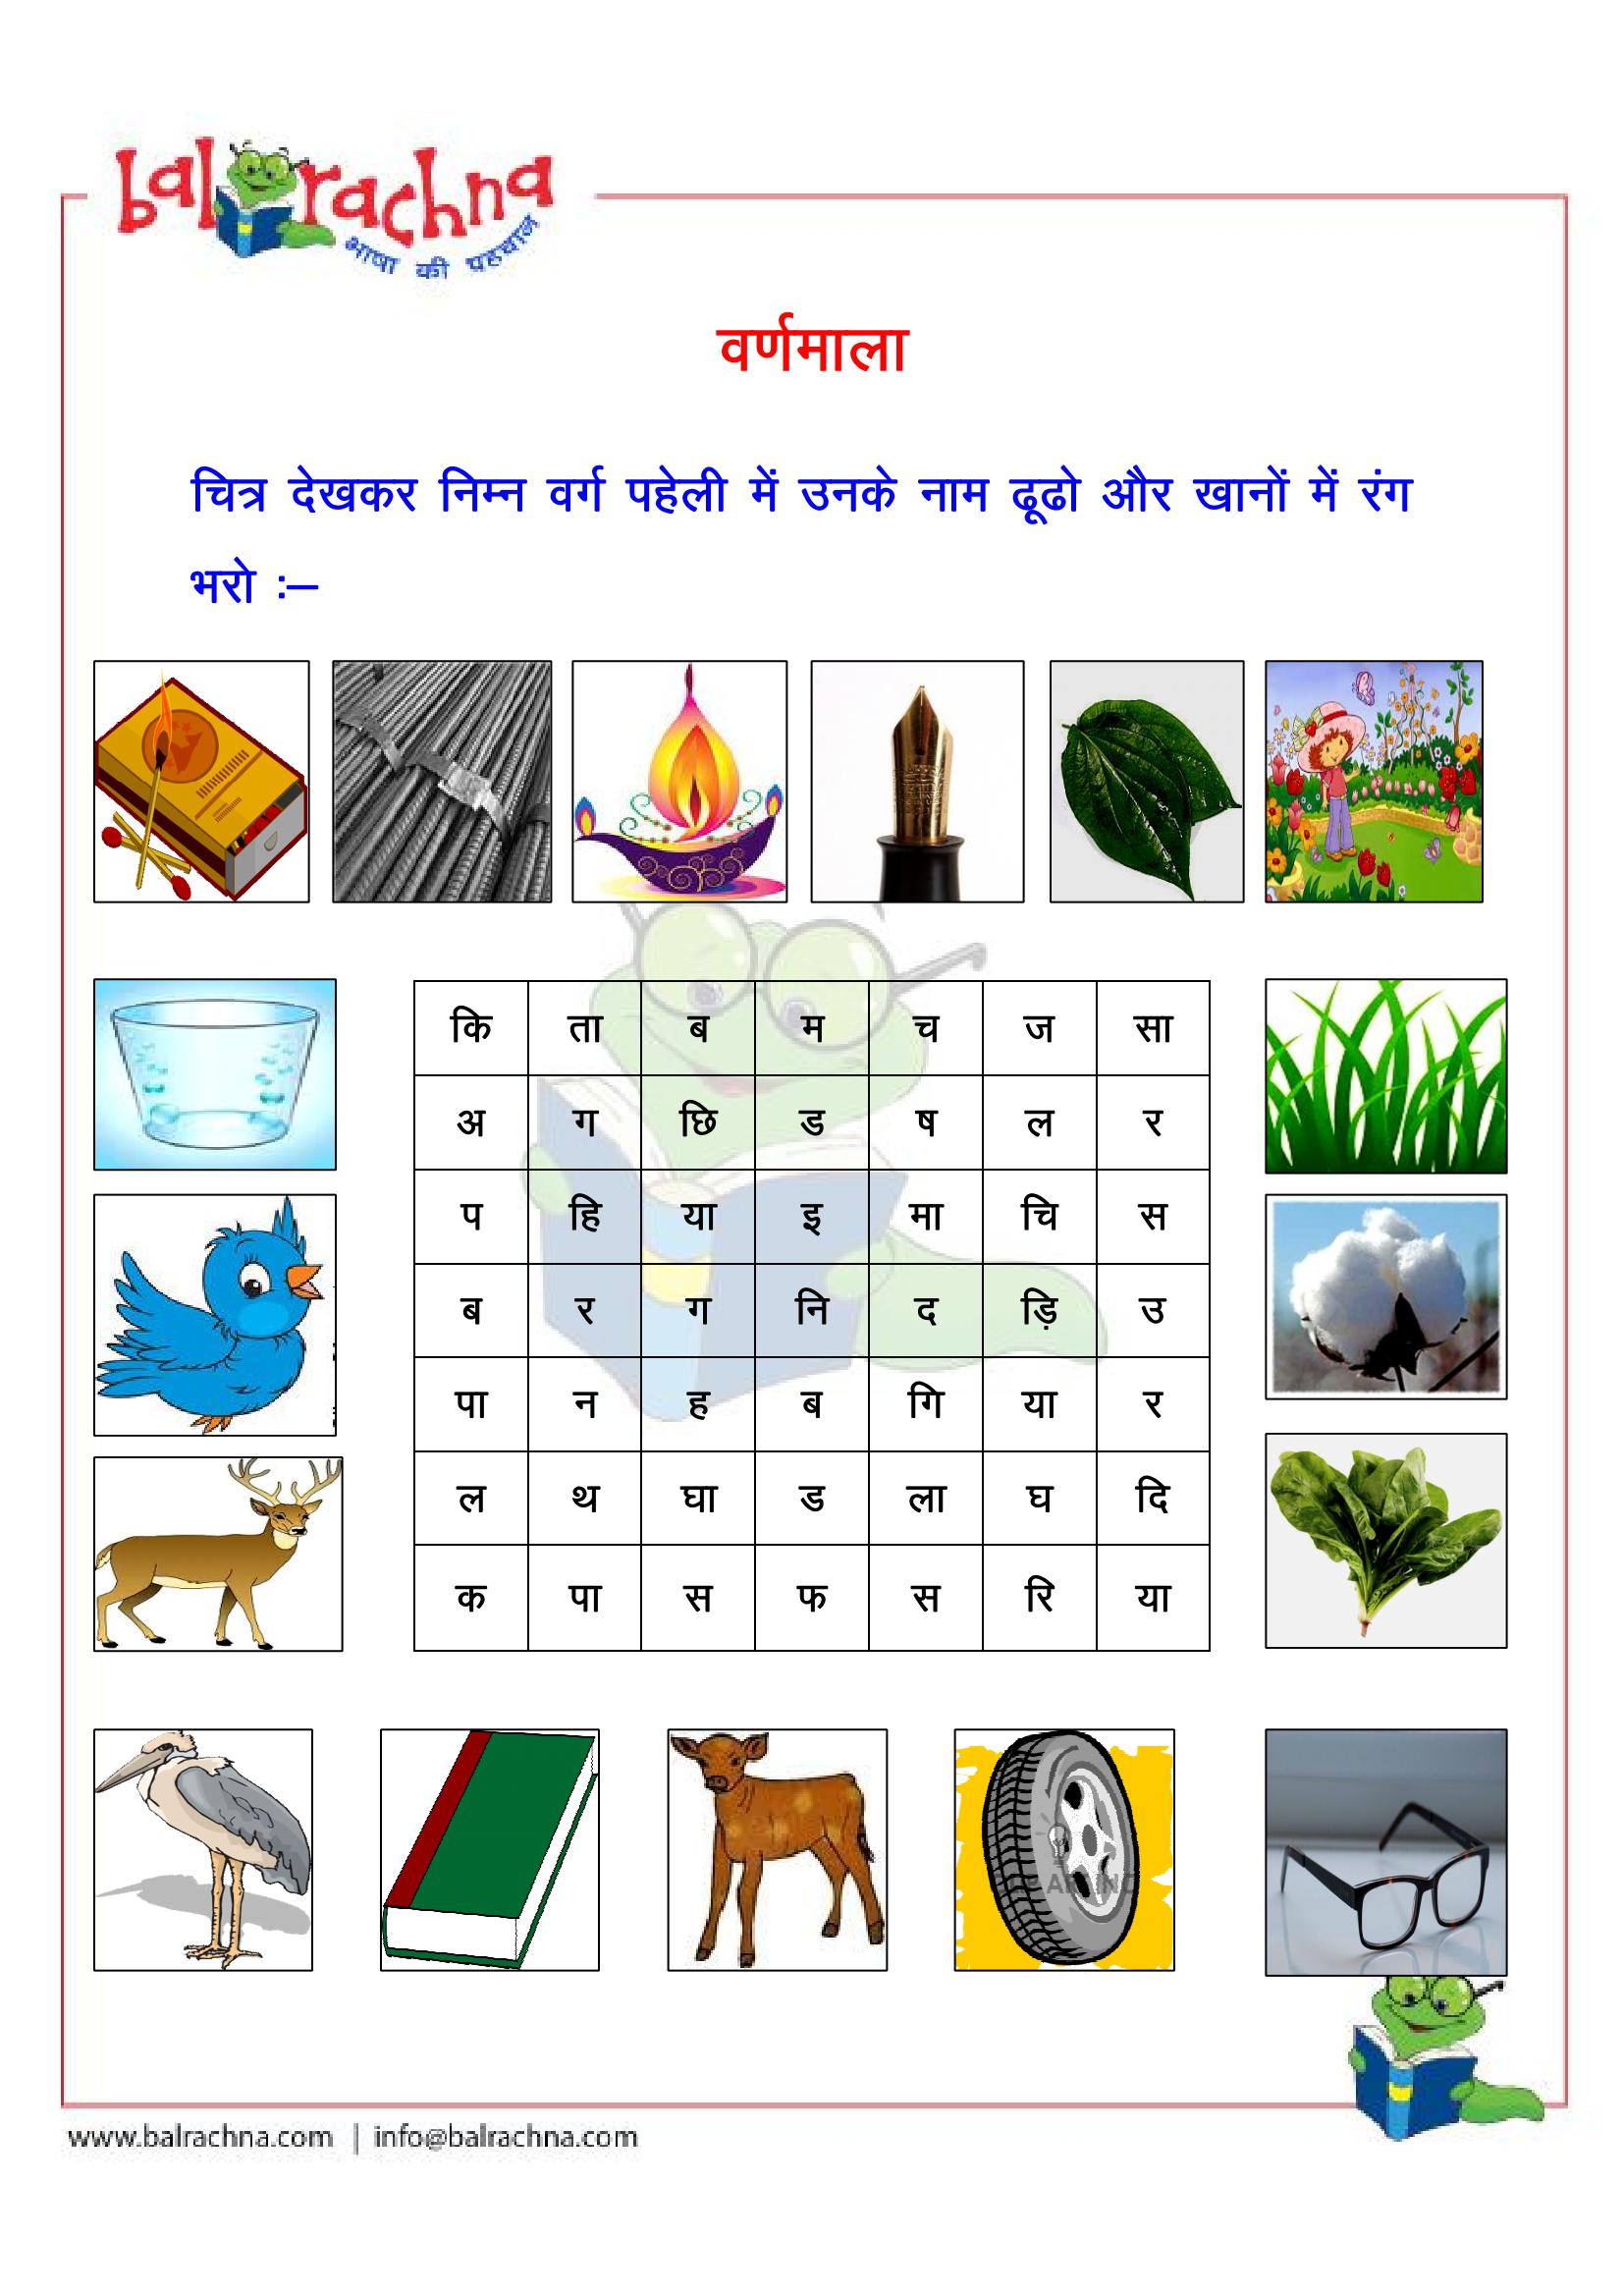 Pin By Vandana Yadav On Rachna Maheshwari Crossword Puzzles For Kids Hindi Worksheets Learn Hindi Hindi Alphabet [ 2338 x 1653 Pixel ]